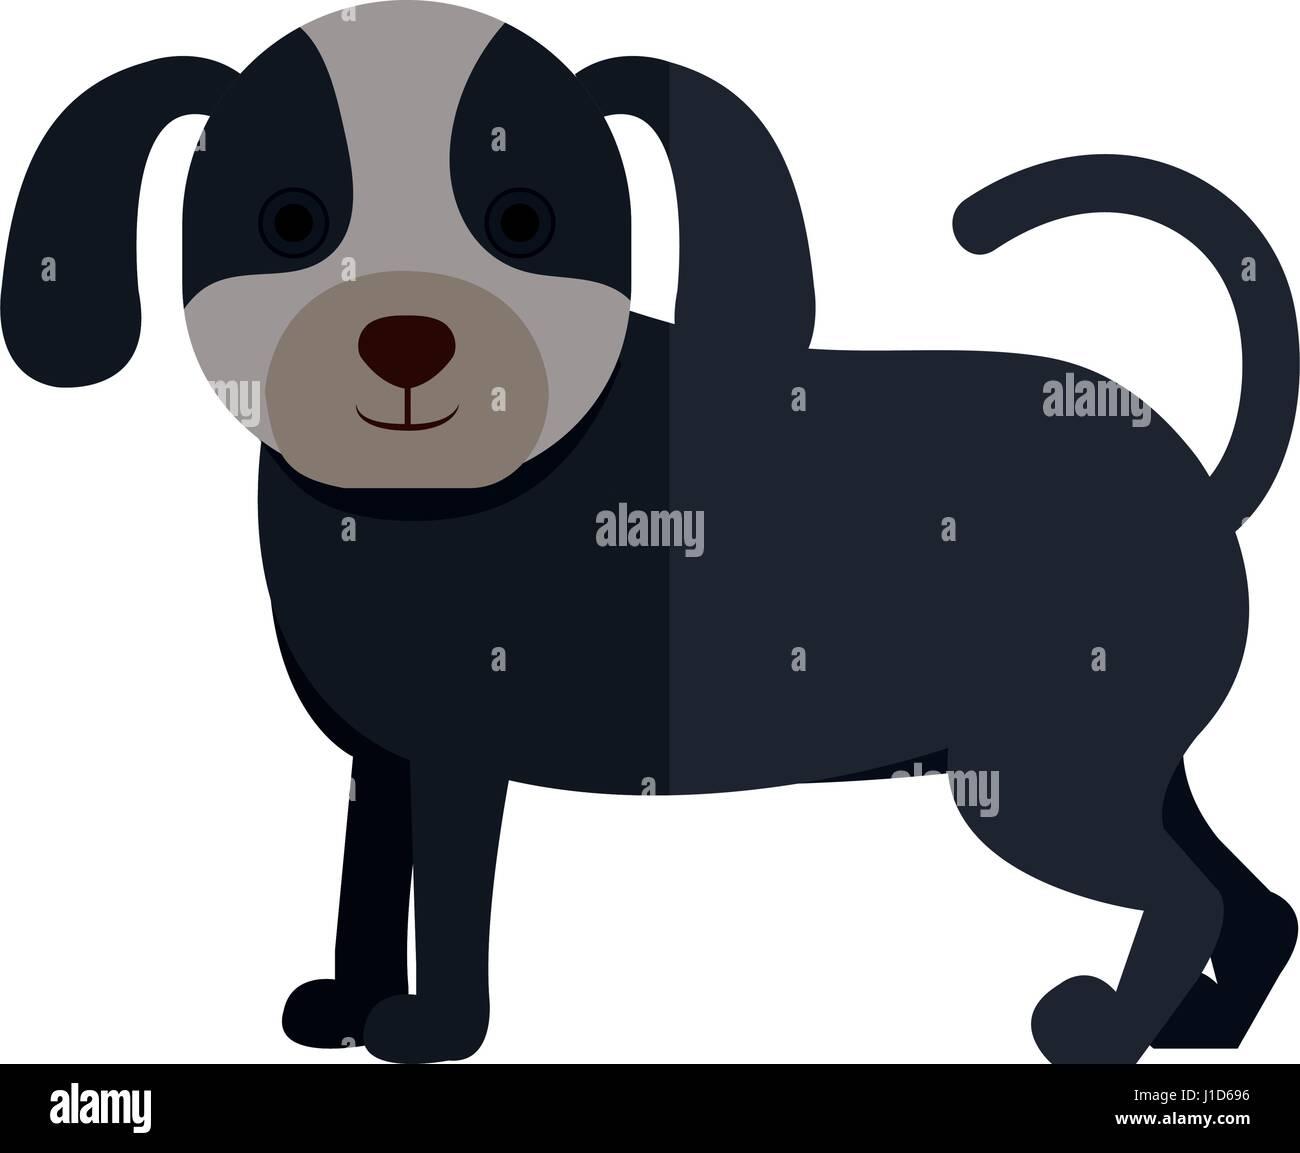 cute dog pet icon - Stock Image